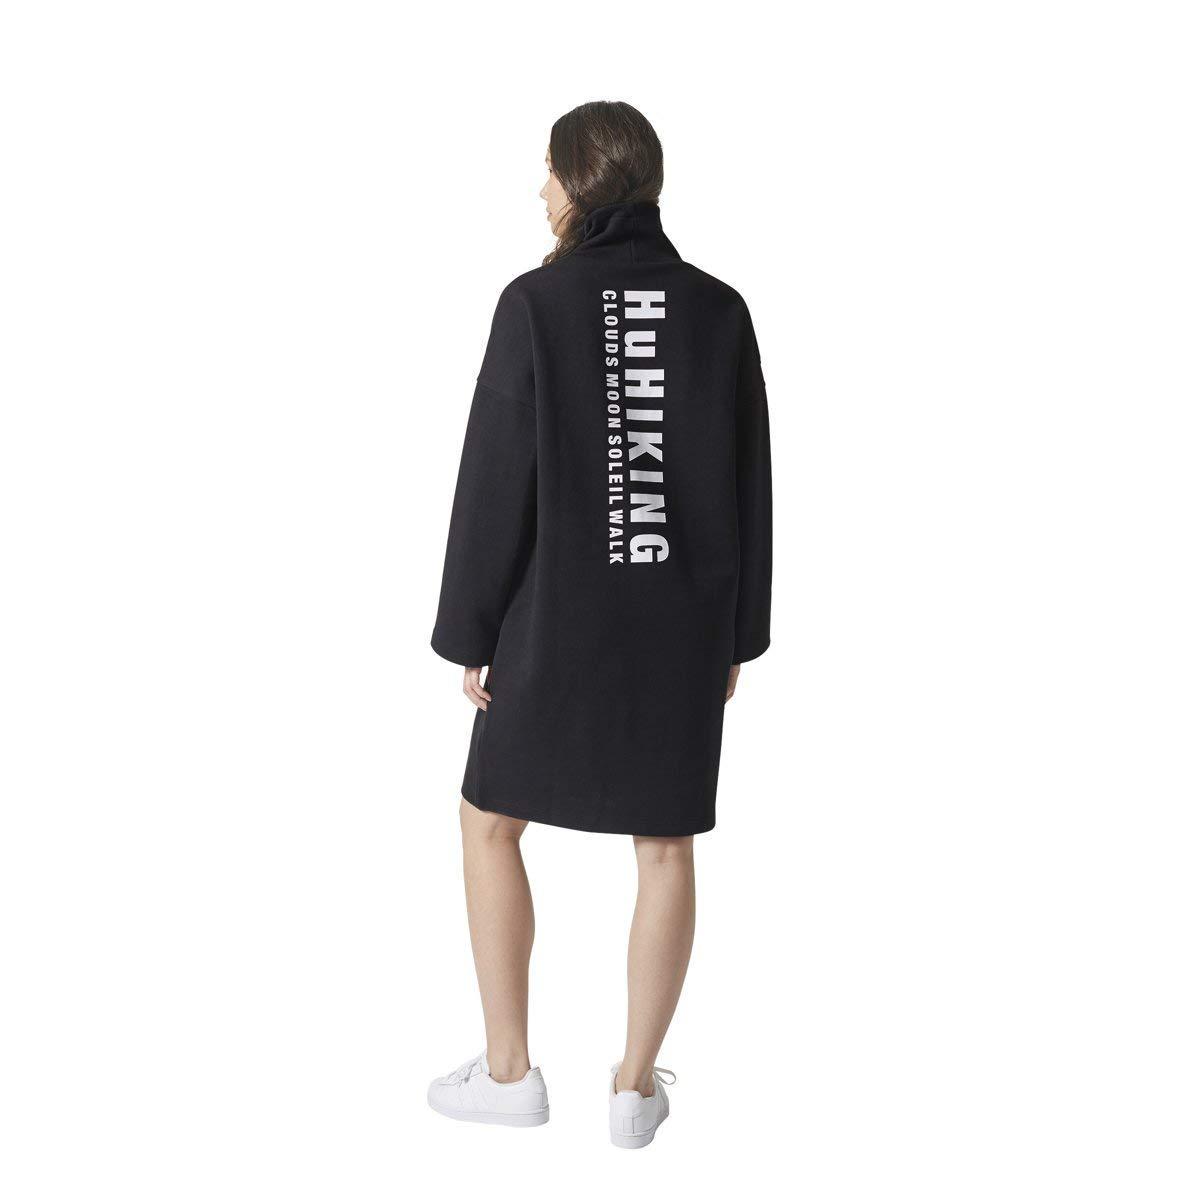 dc6da455ca4 adidas Women's Originals Pharrell Williams hu Hiking Dress CY7516 - Black  -: Amazon.co.uk: Clothing